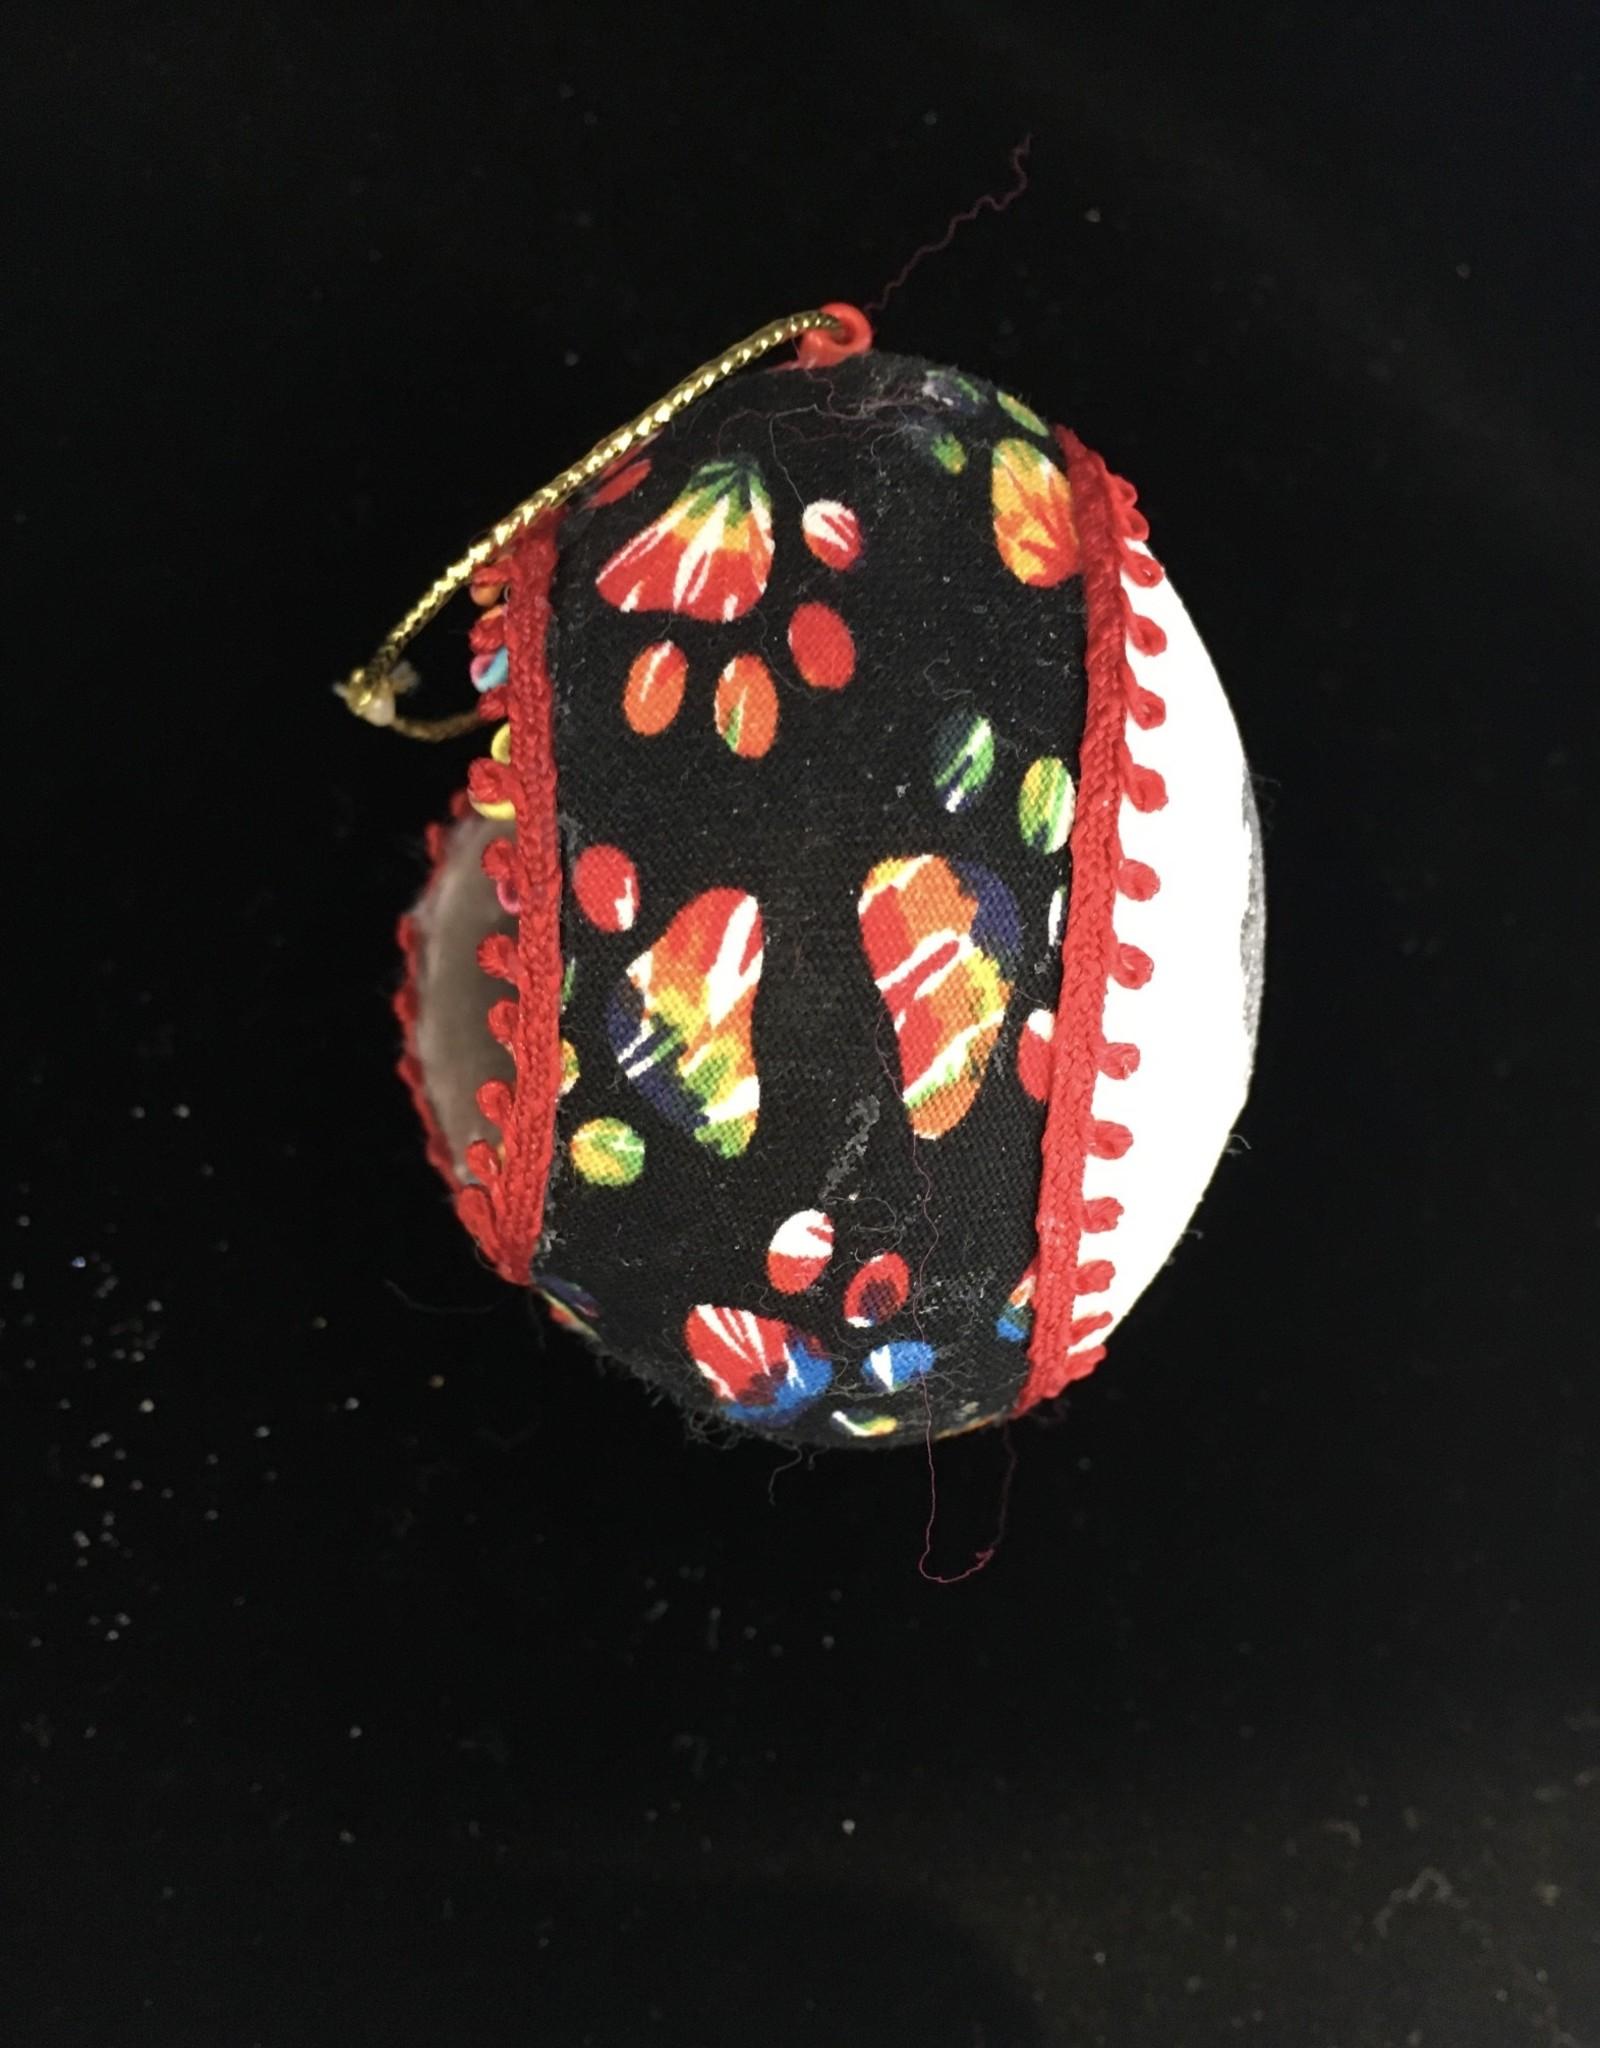 Ammi Brooks Grateful Dead Motorcycle Real Egg Ornament